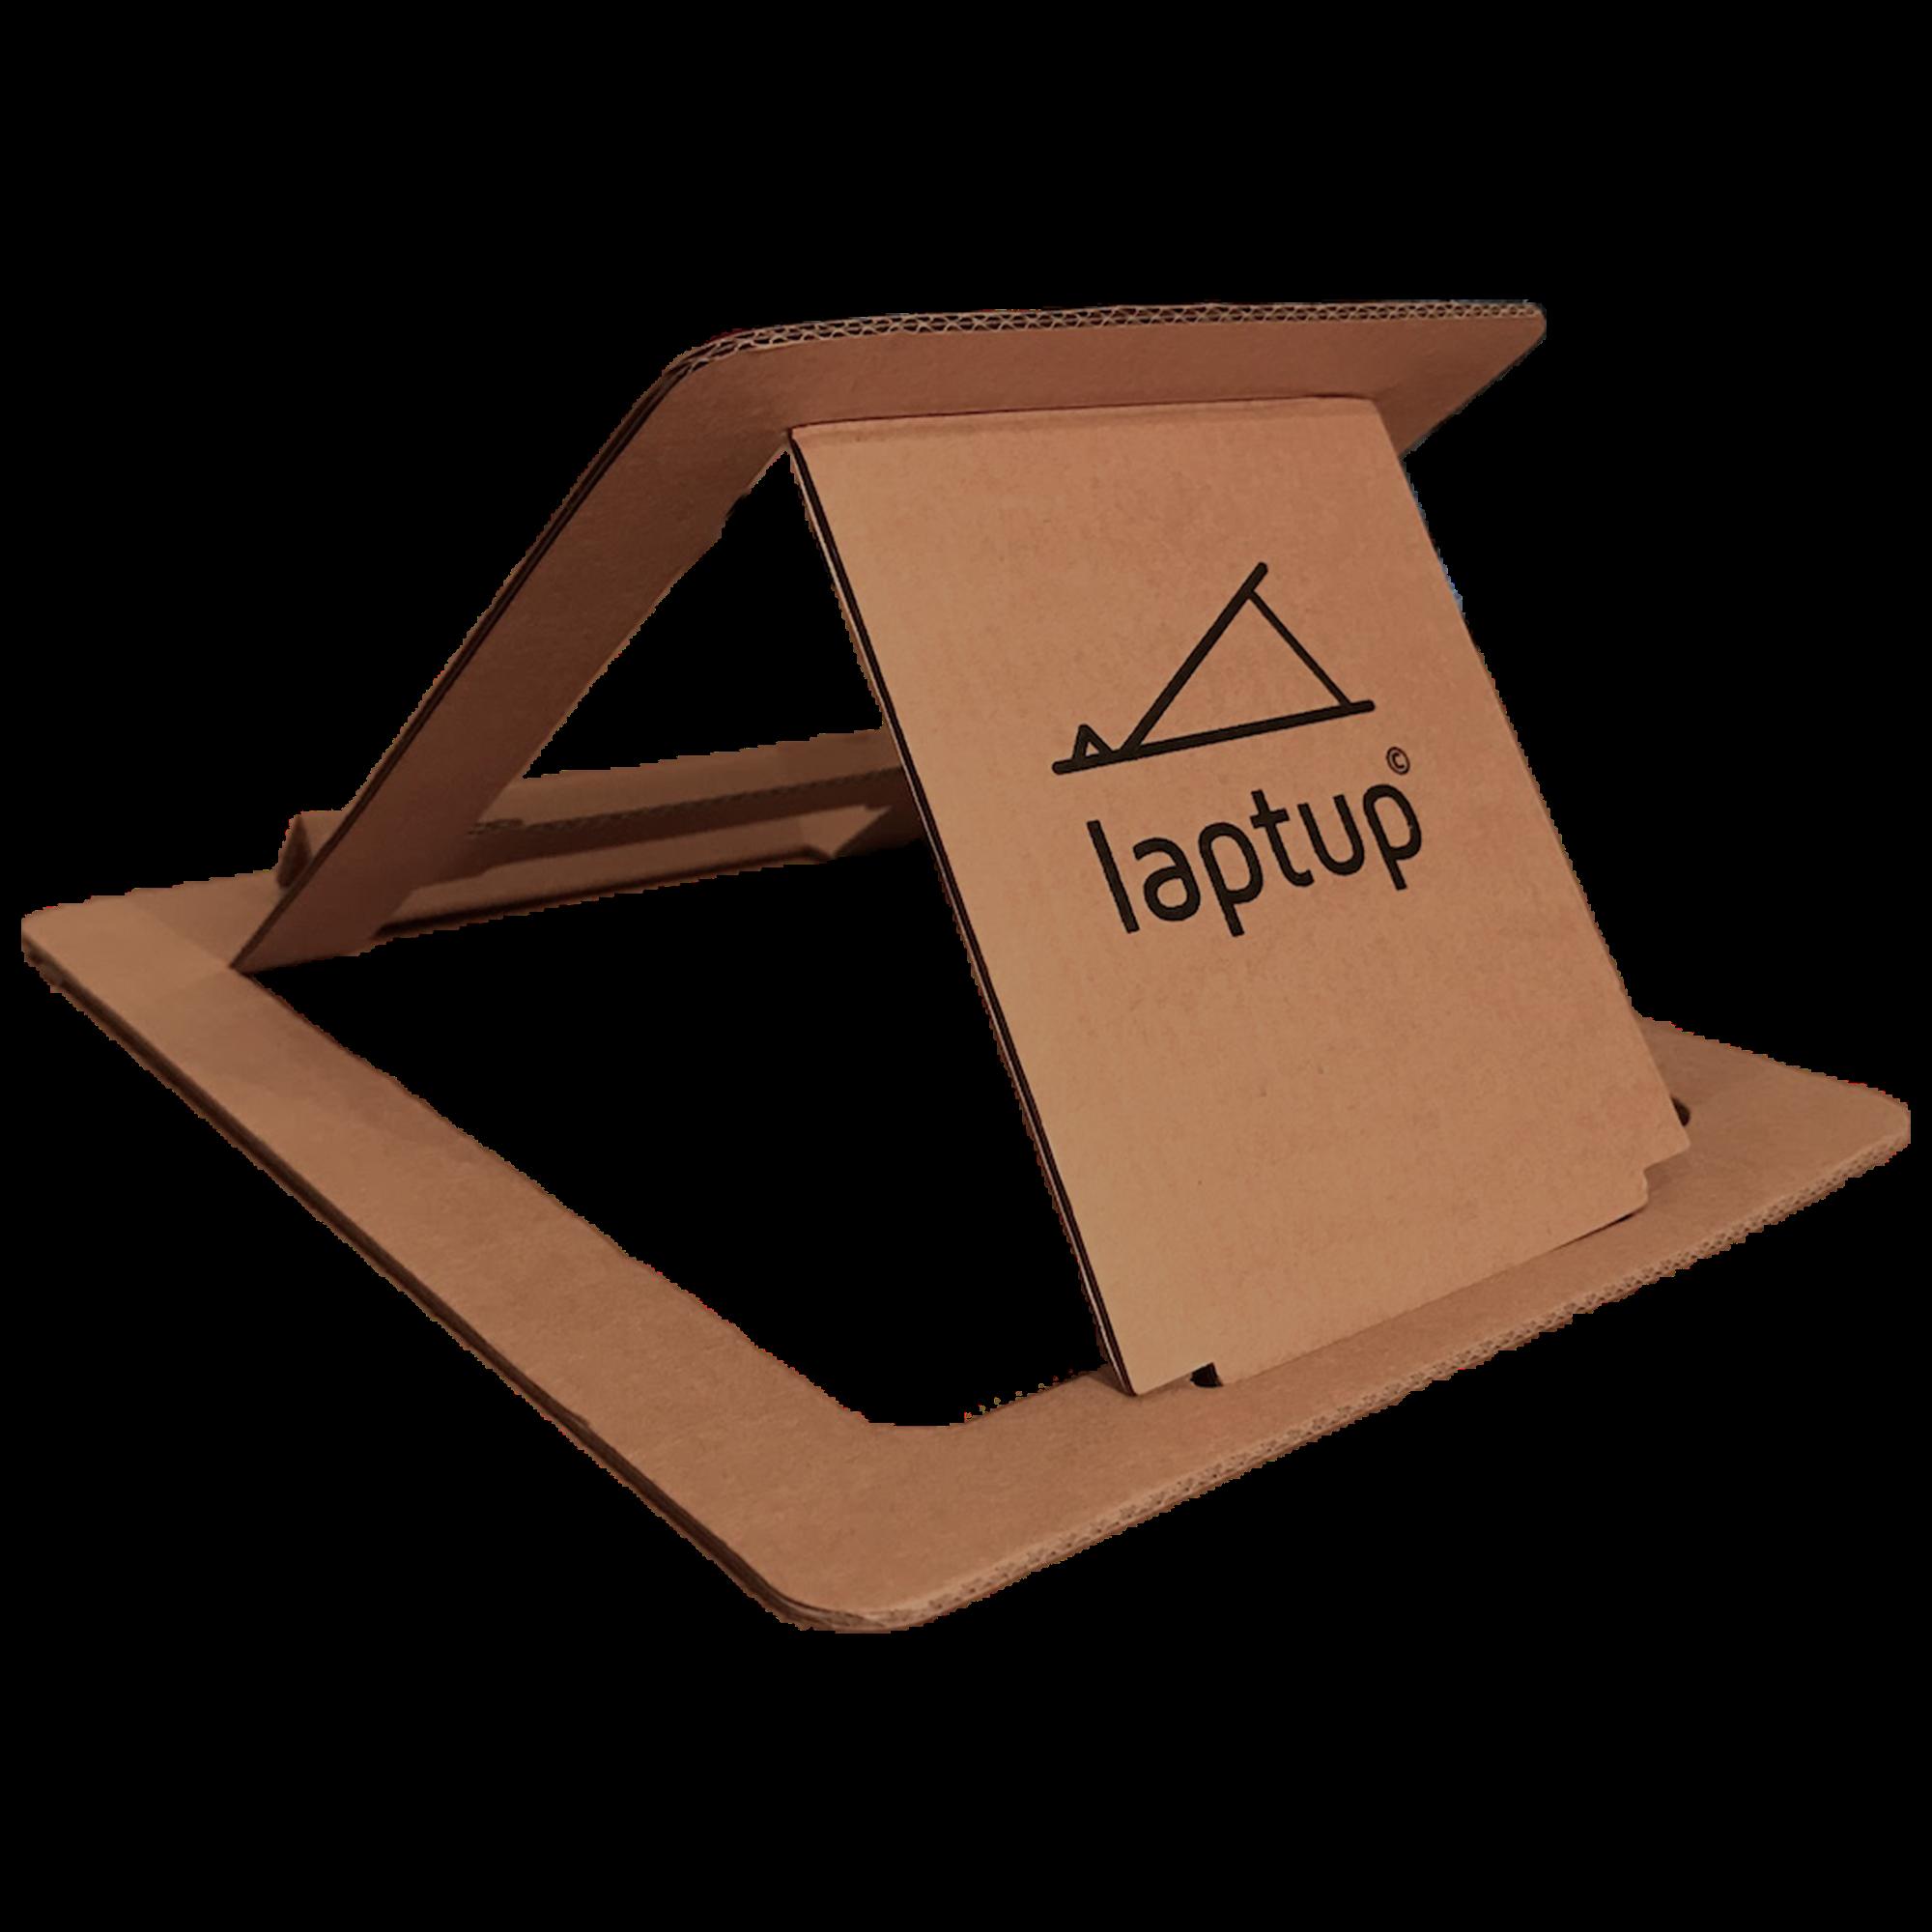 Laptup Classic 2.png